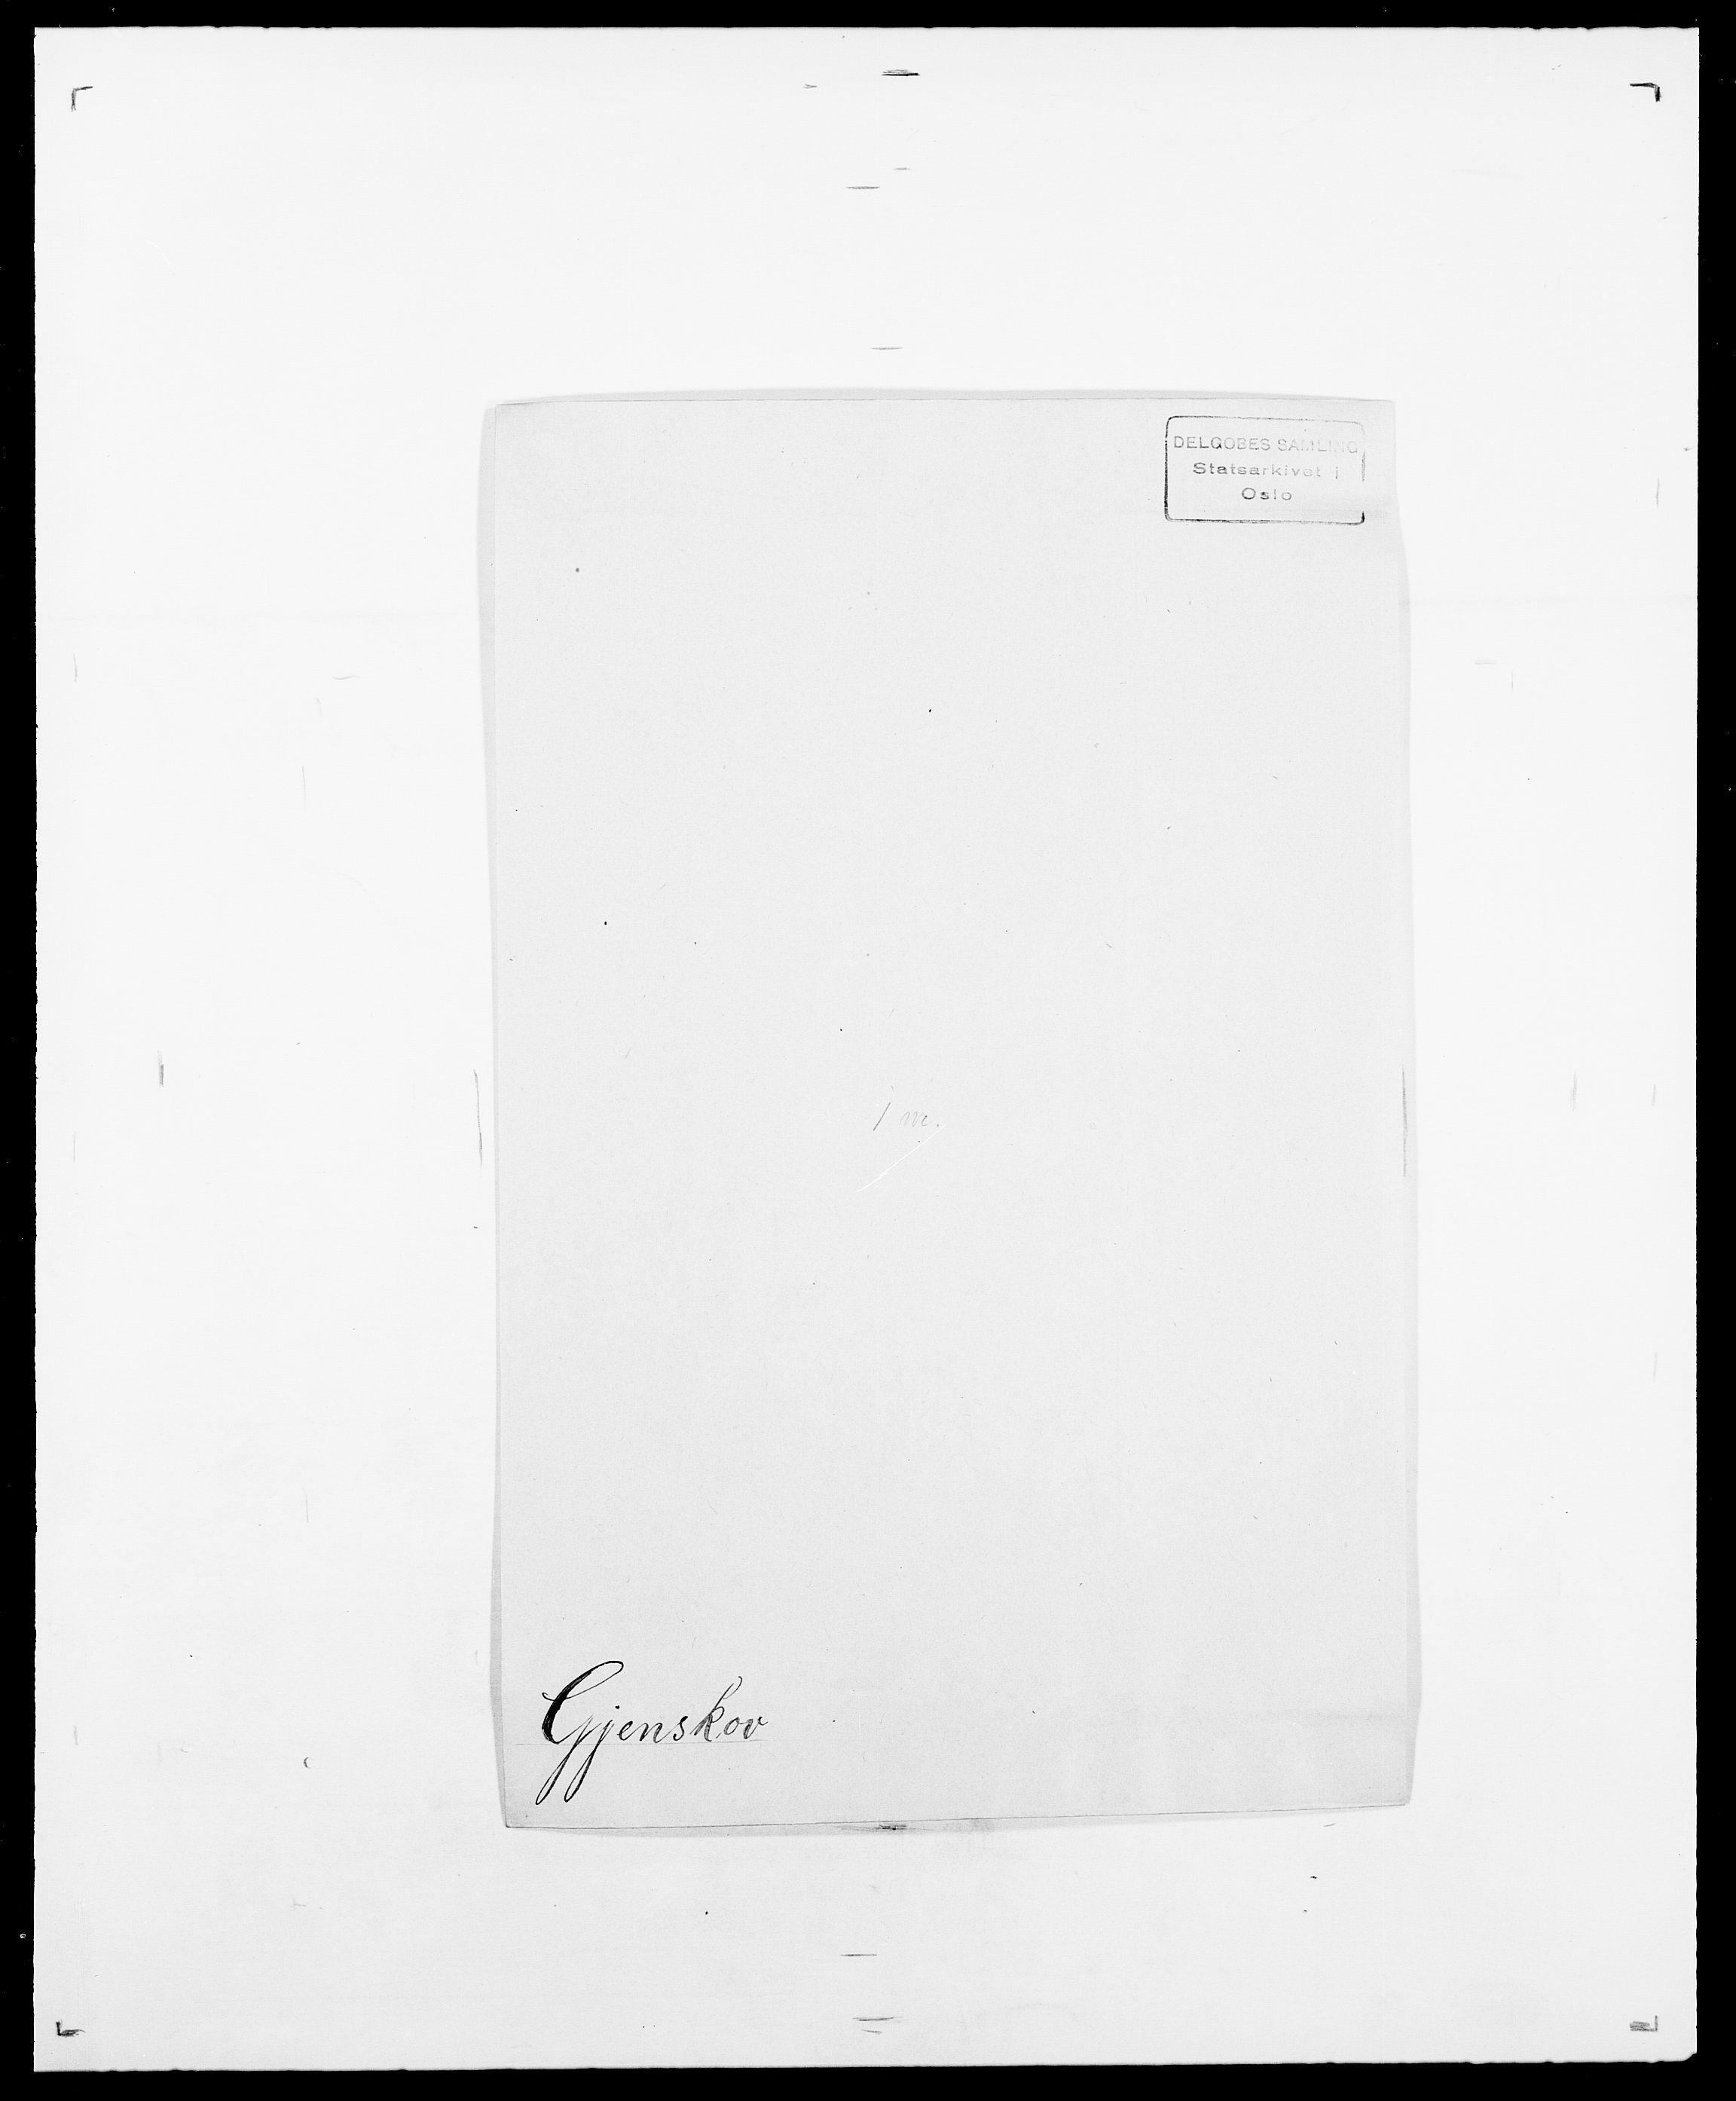 SAO, Delgobe, Charles Antoine - samling, D/Da/L0014: Giebdhausen - Grip, s. 101